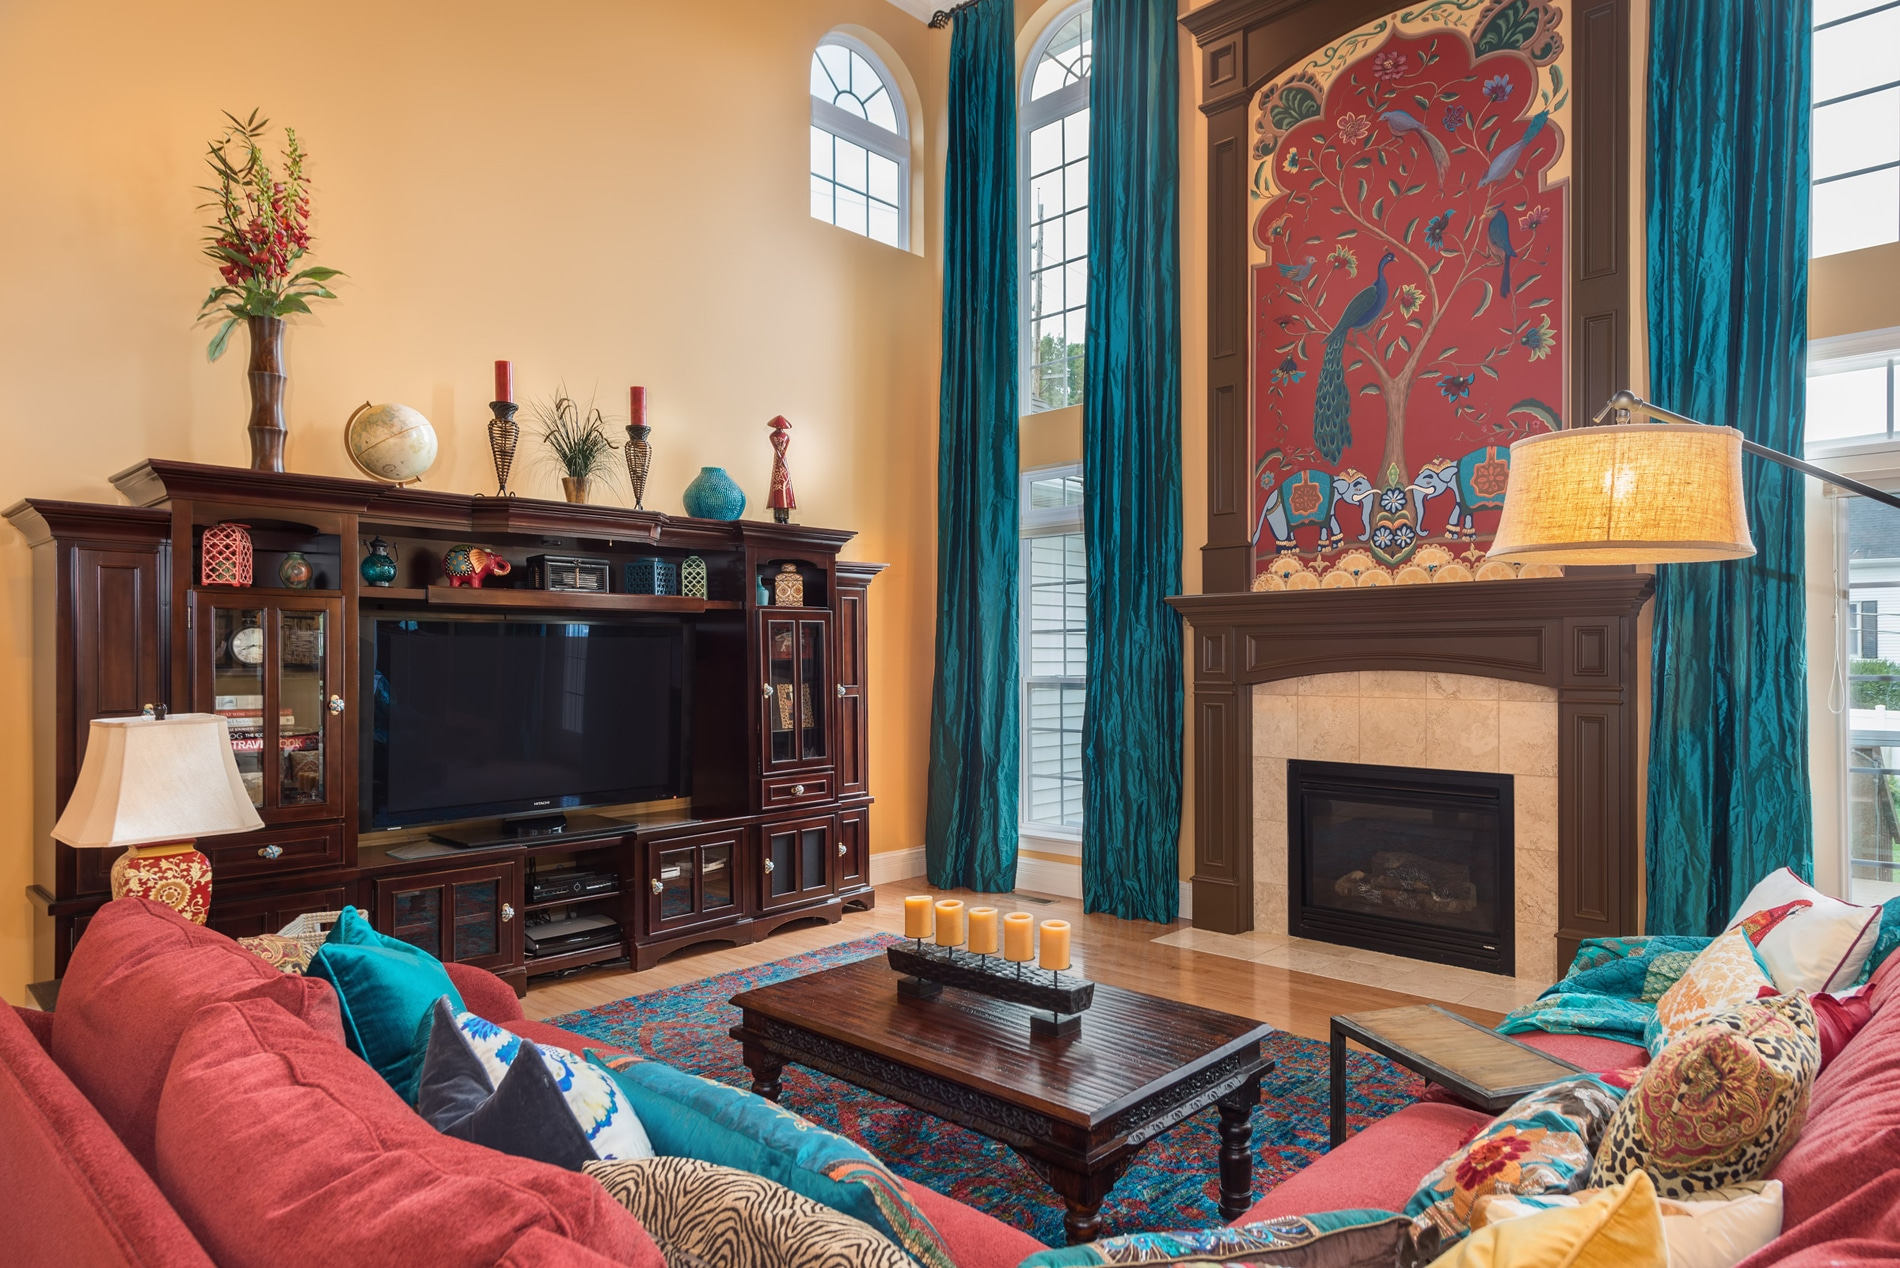 Moroccan interior design by st louis interior designers for St louis interior designers